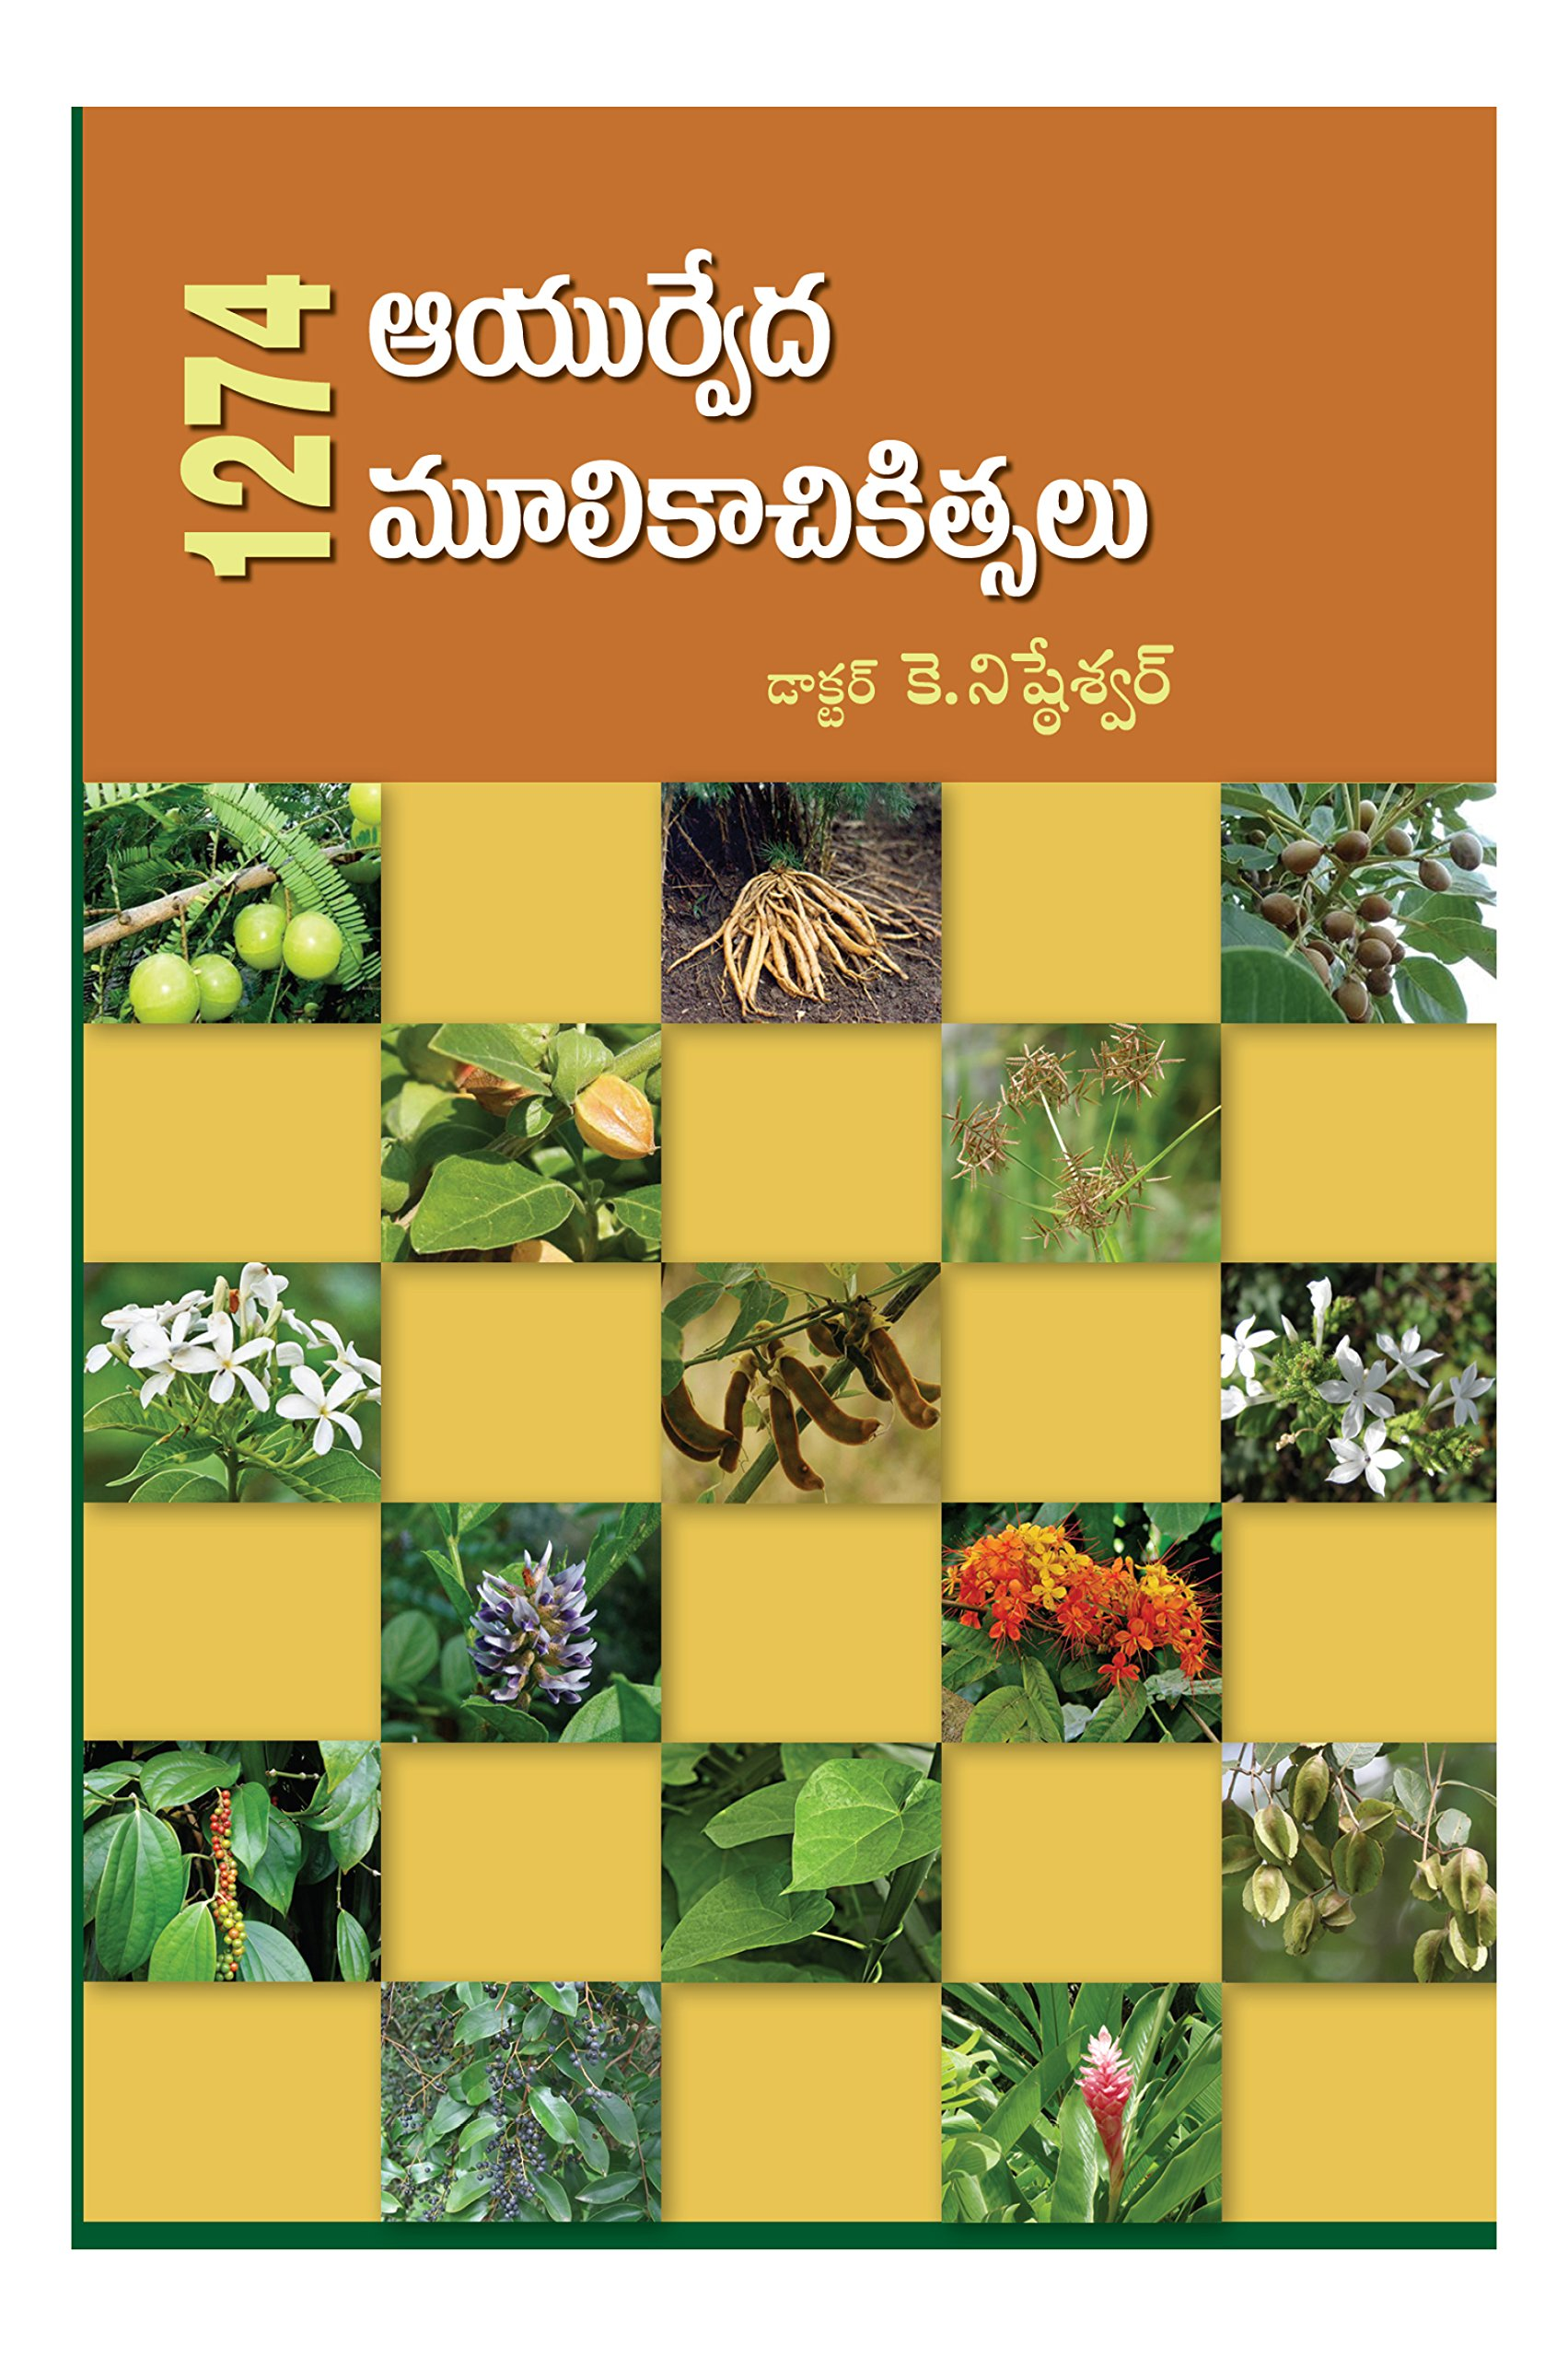 In pdf ayurvedic telugu medicine books